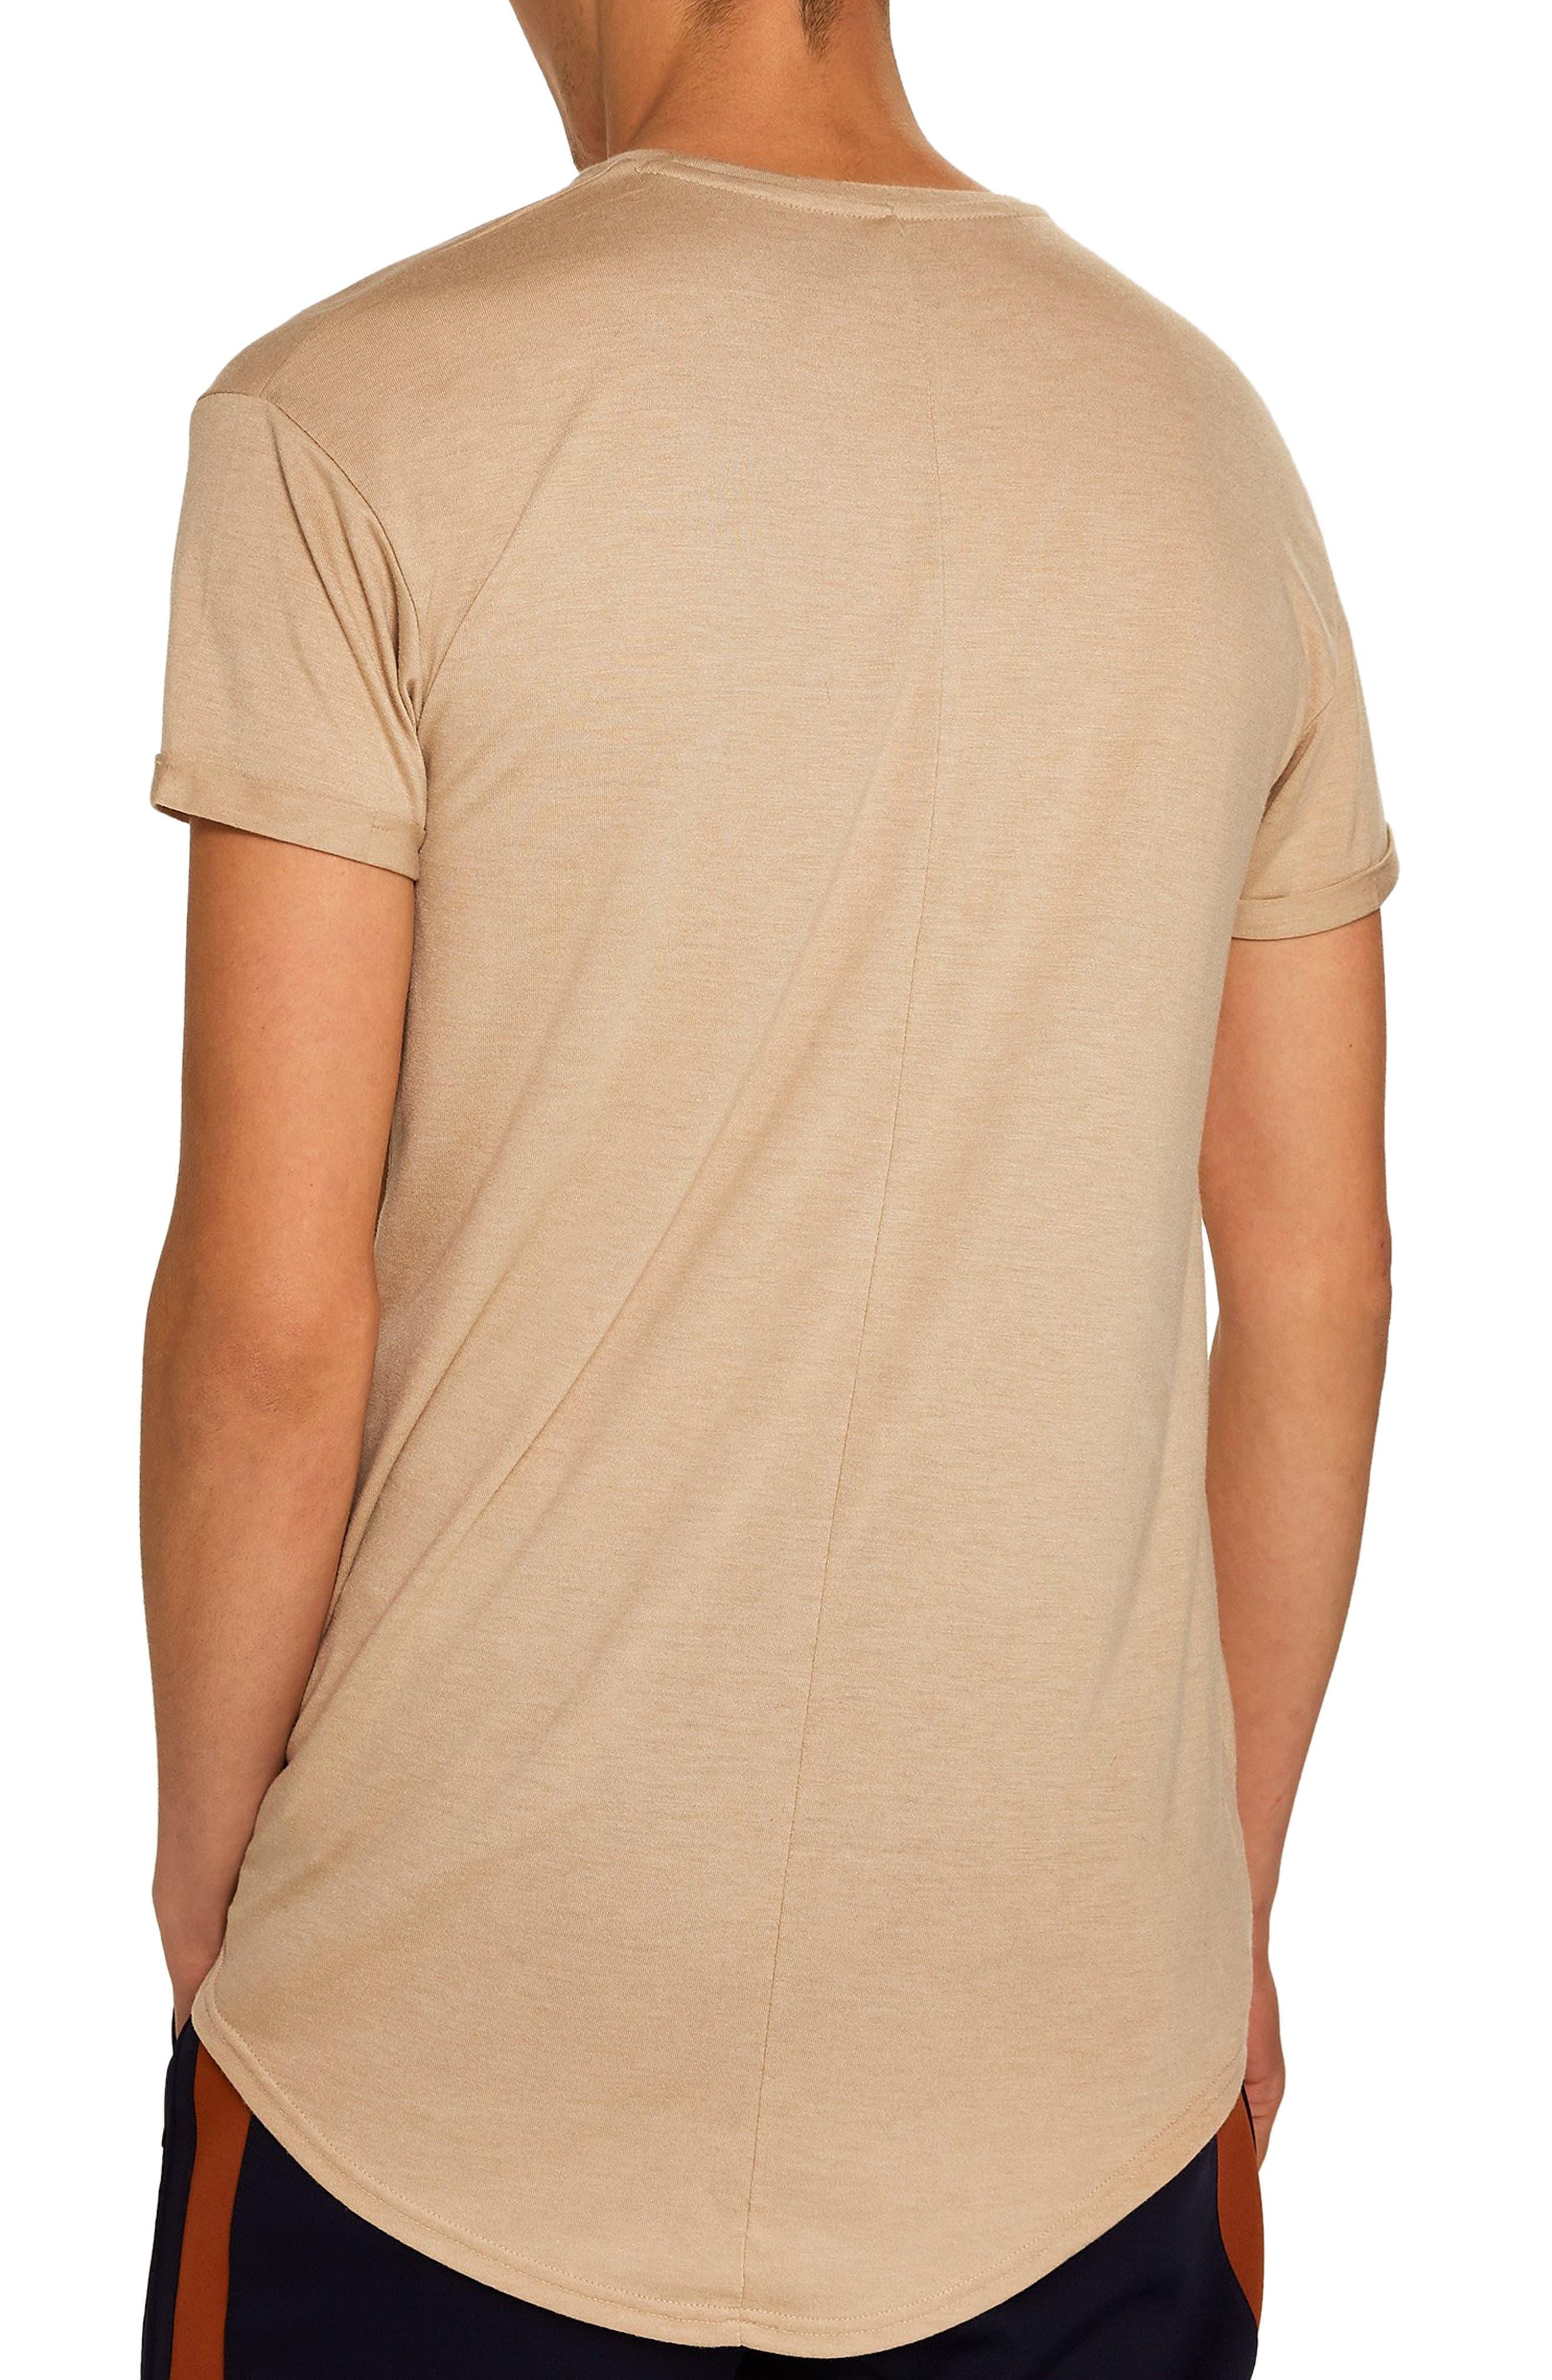 TOPMAN, Scotty Longline T-Shirt, Alternate thumbnail 2, color, STONE